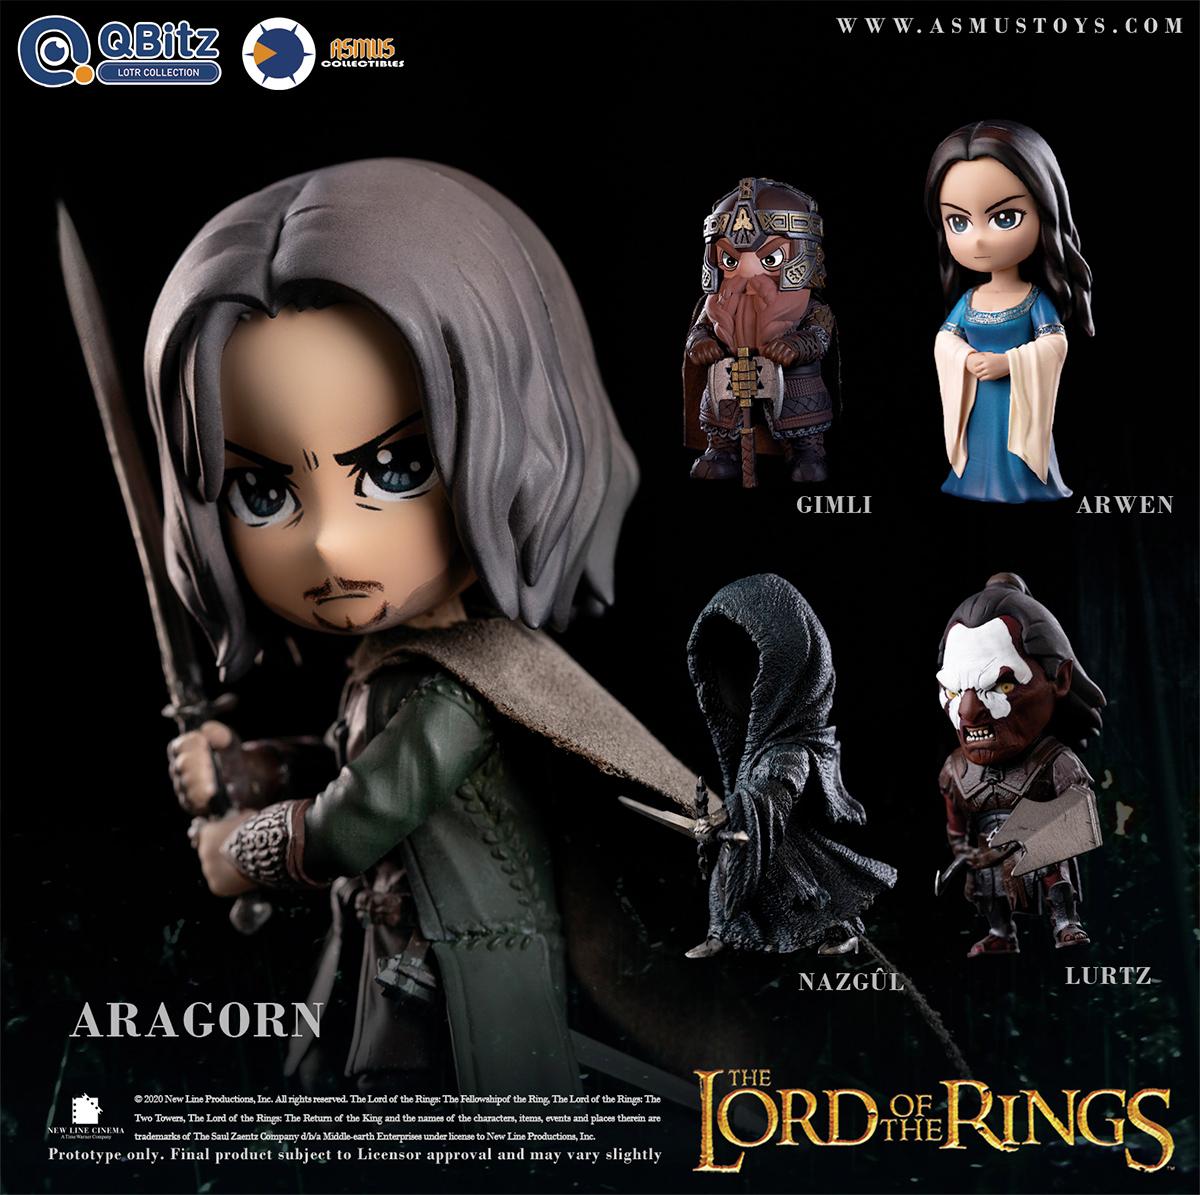 Bonecos O Senhor dos Aneis The Lord of the Rings QBitz Series 1 Boxed Set